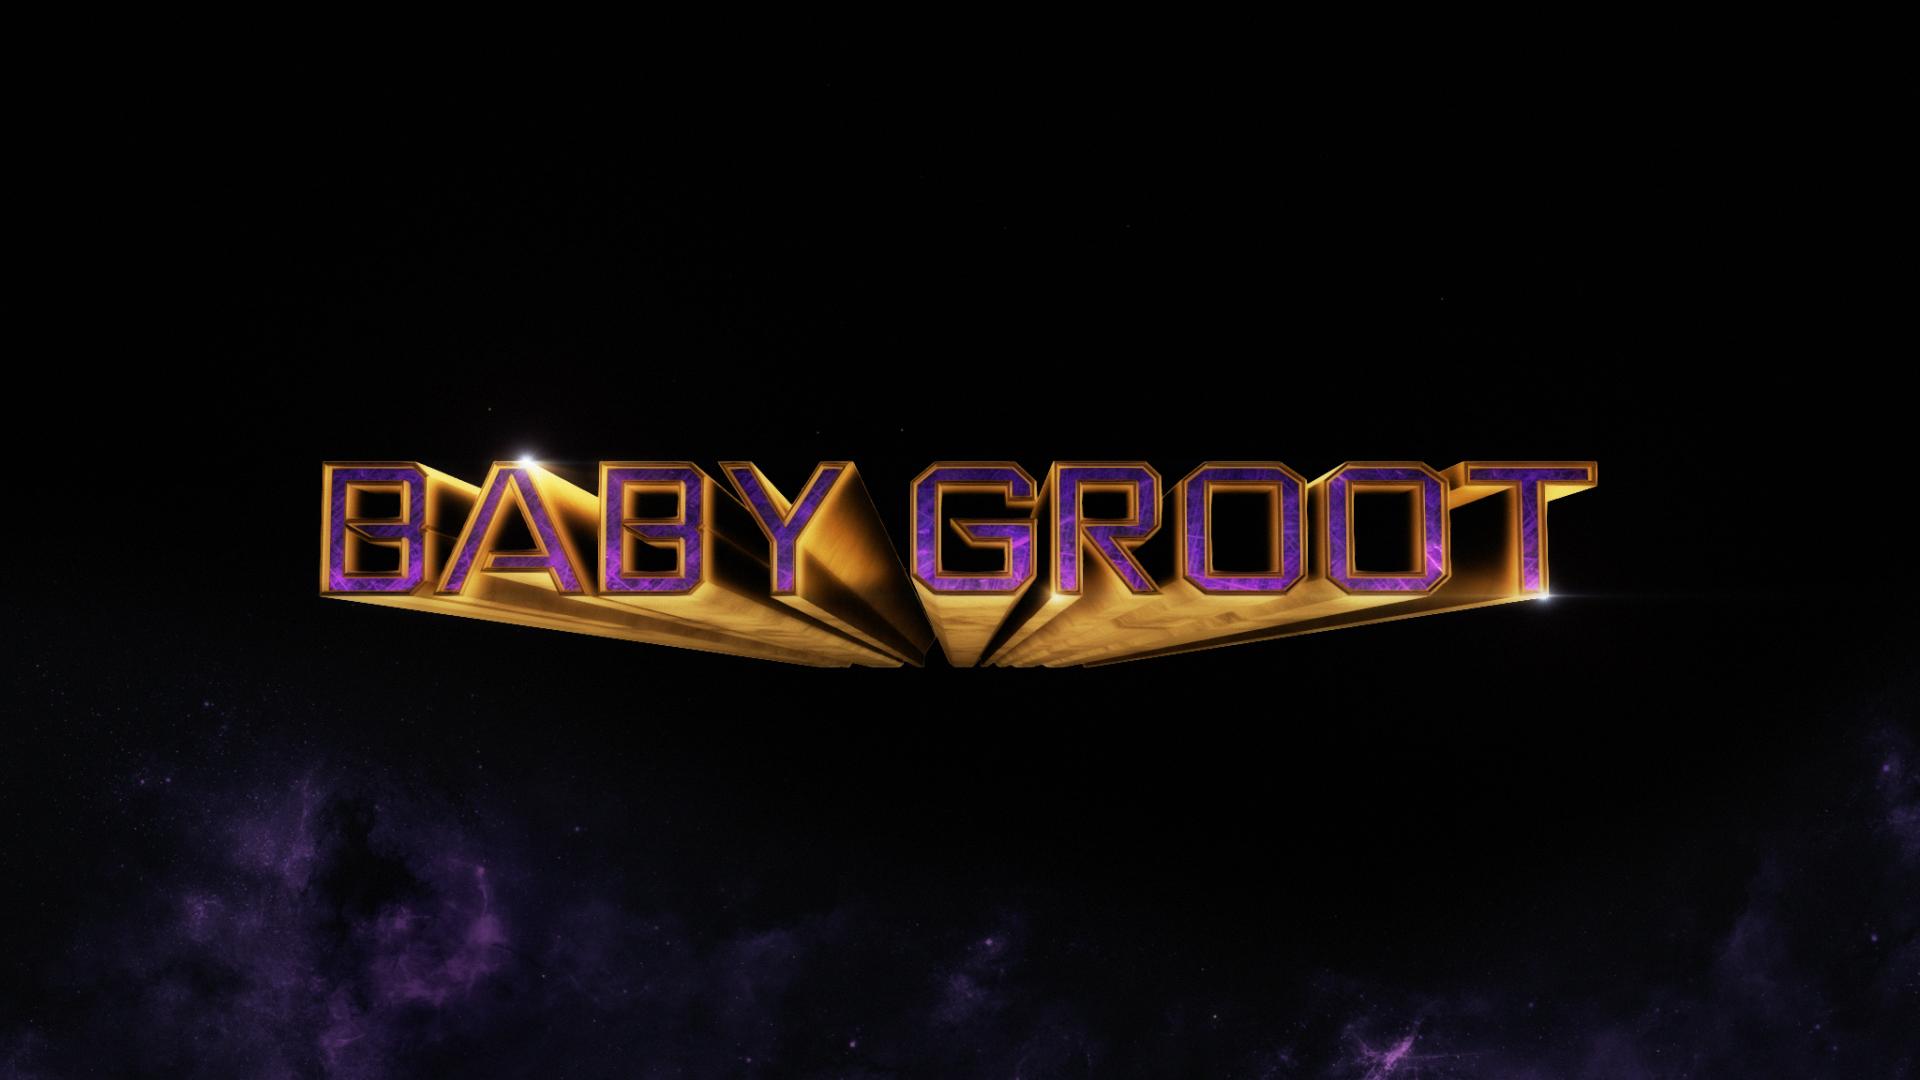 GOTG2_001_BABY_GROOT_v02_AK_HD.jpg